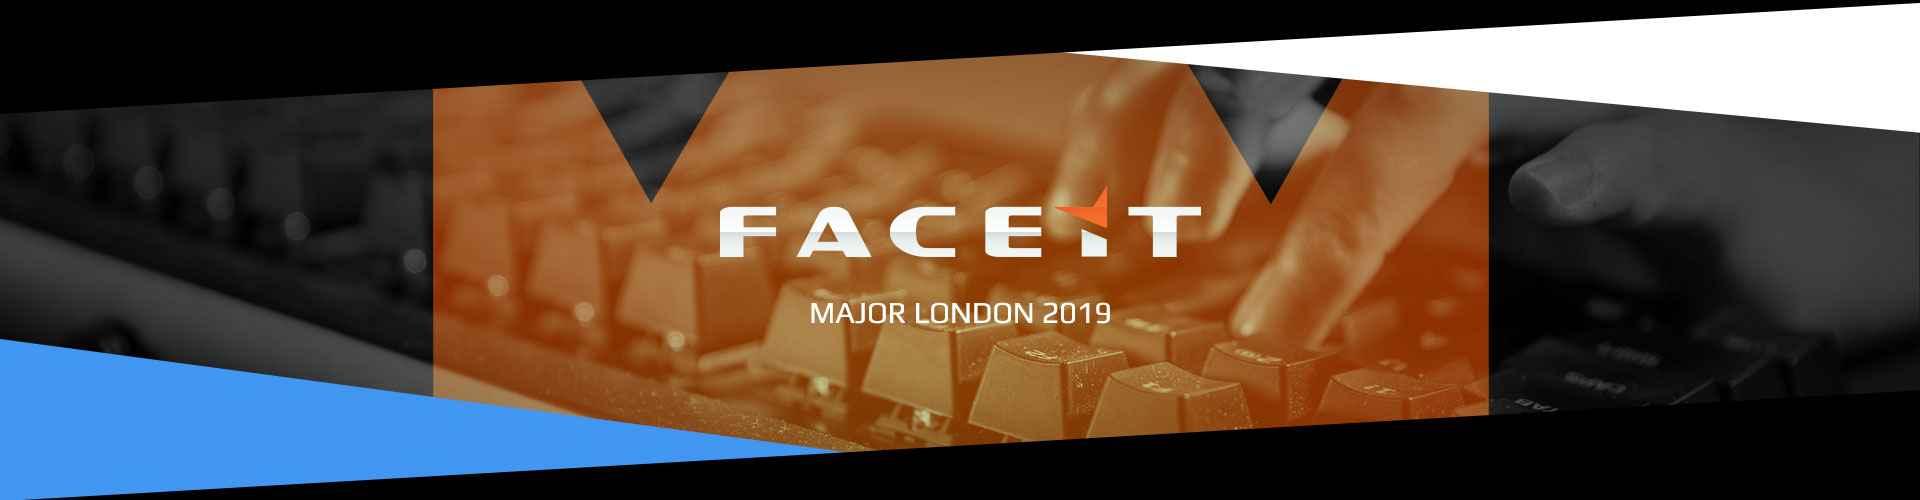 Counter-Strike: Global Offensive - FACEIT Major London